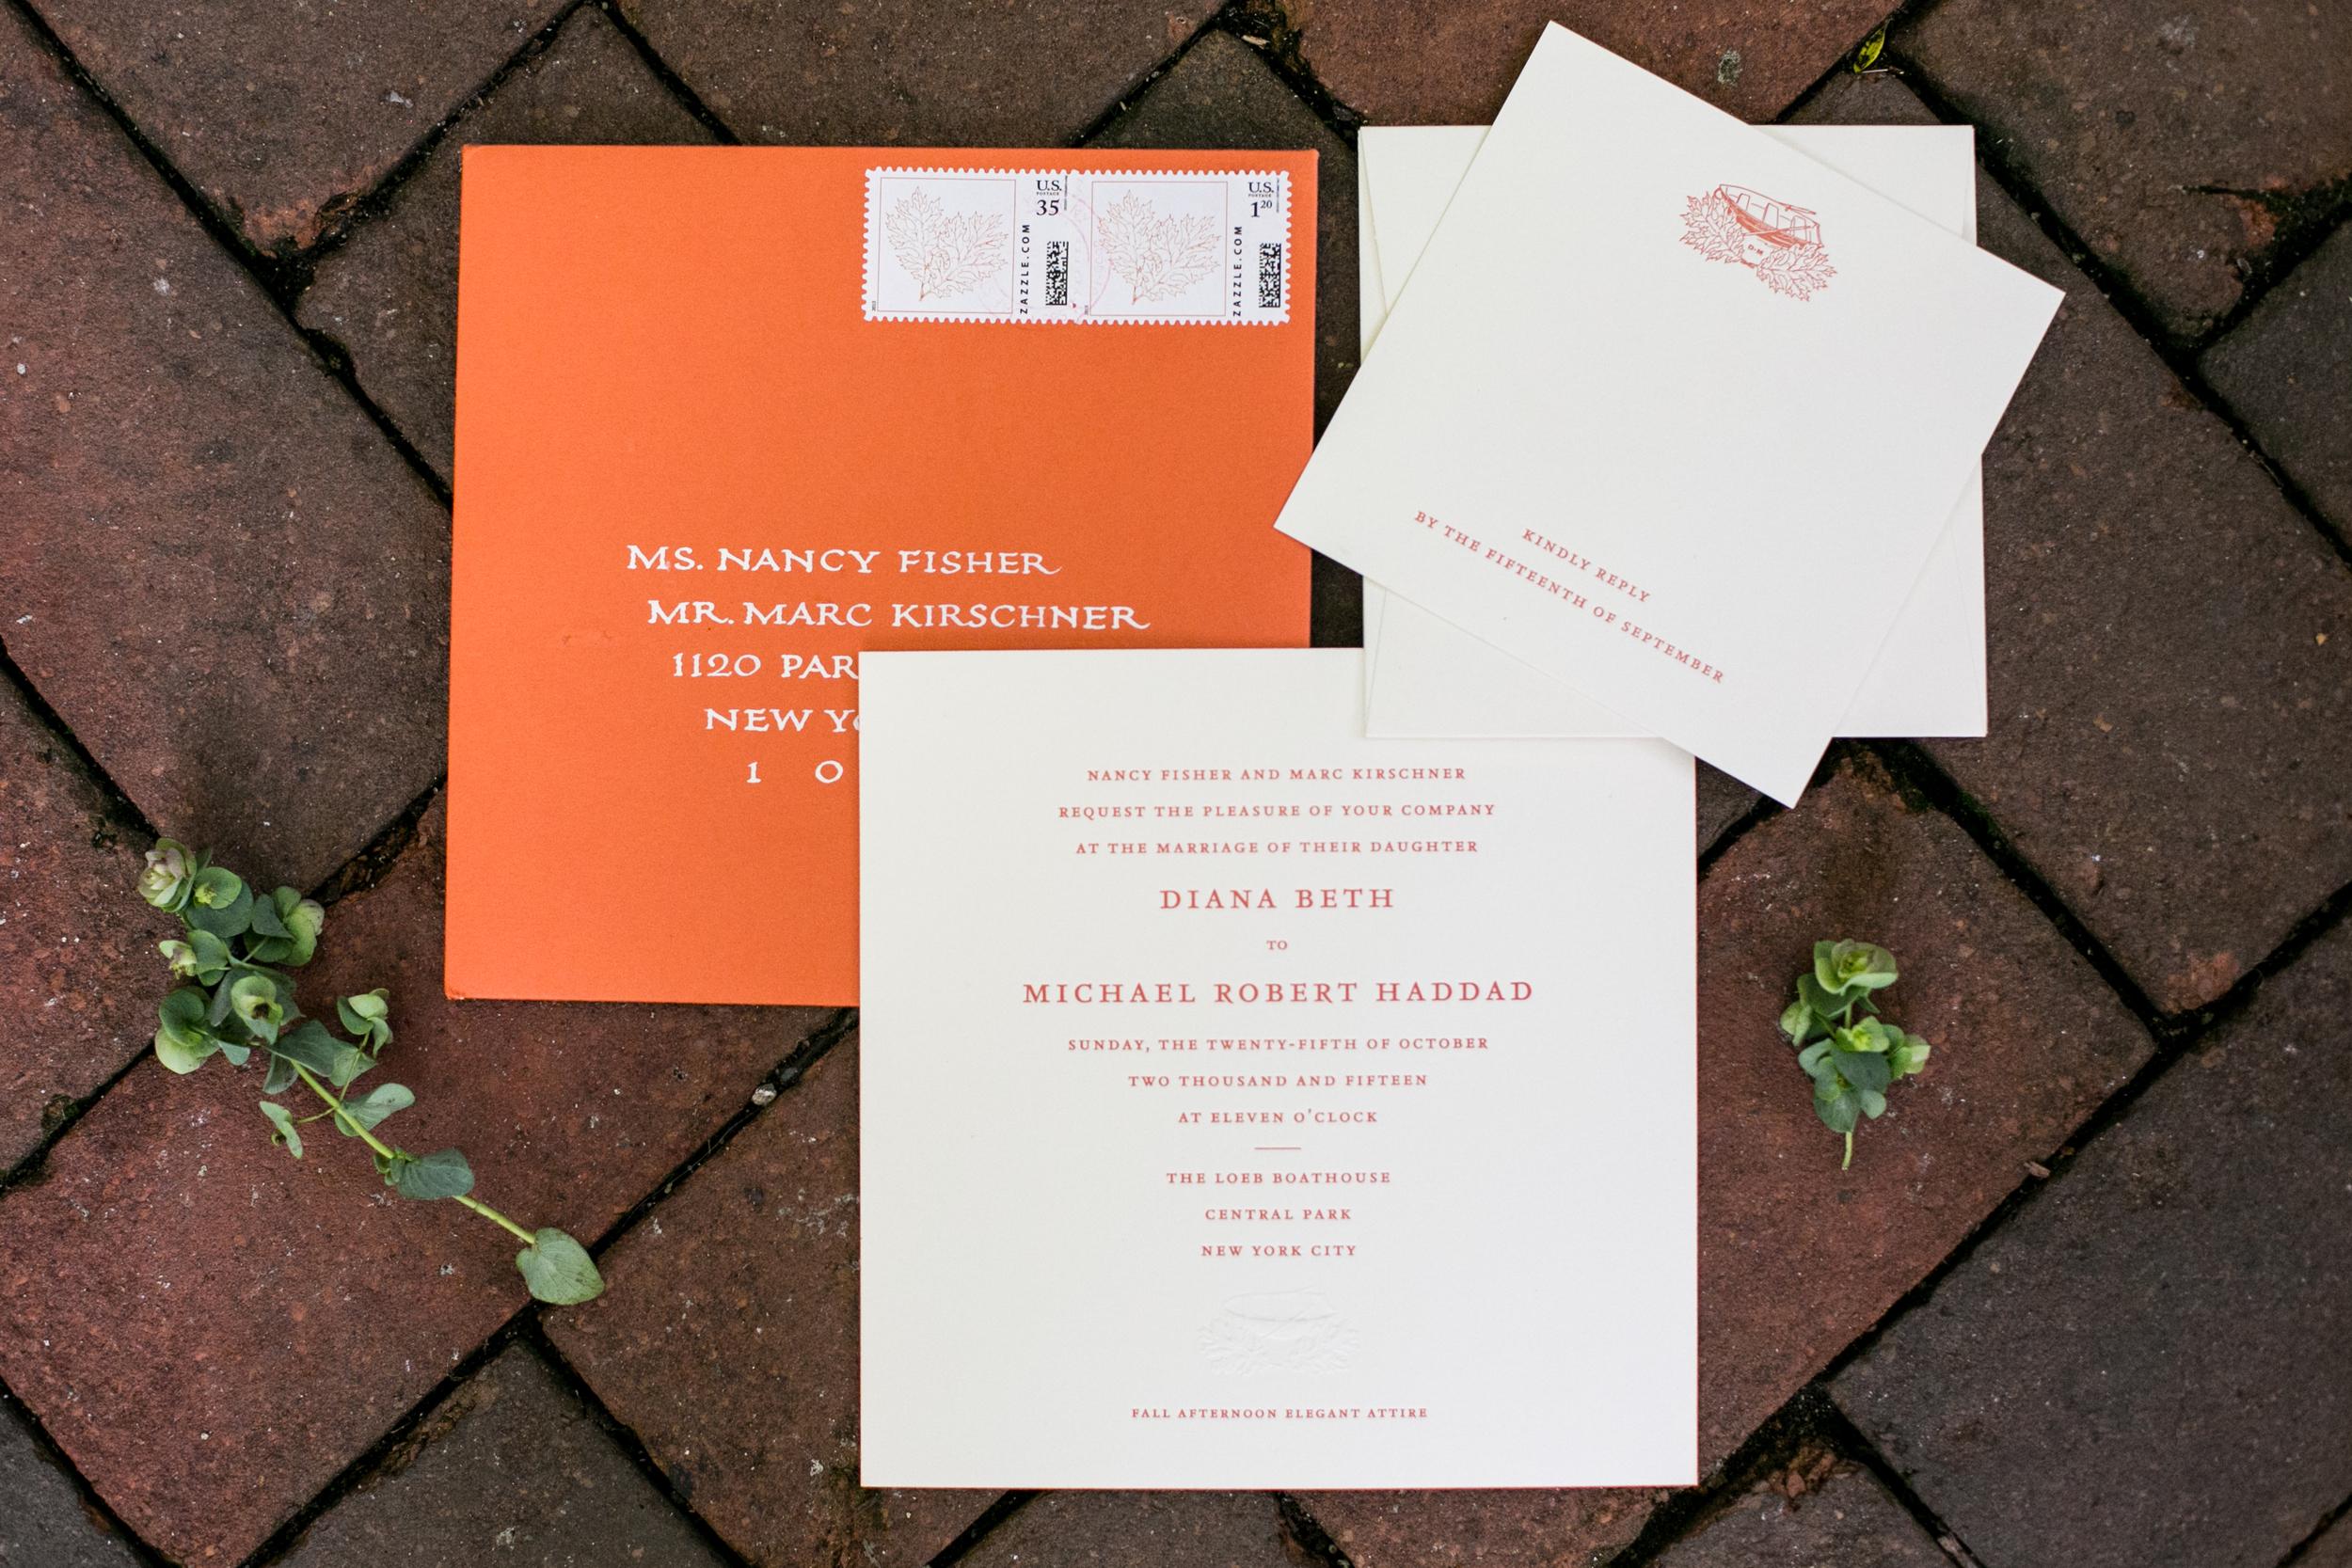 NYC-Wedding-Planner-Andrea-Freeman-Events-Leob-Boathouse-Central-Park-2.jpg